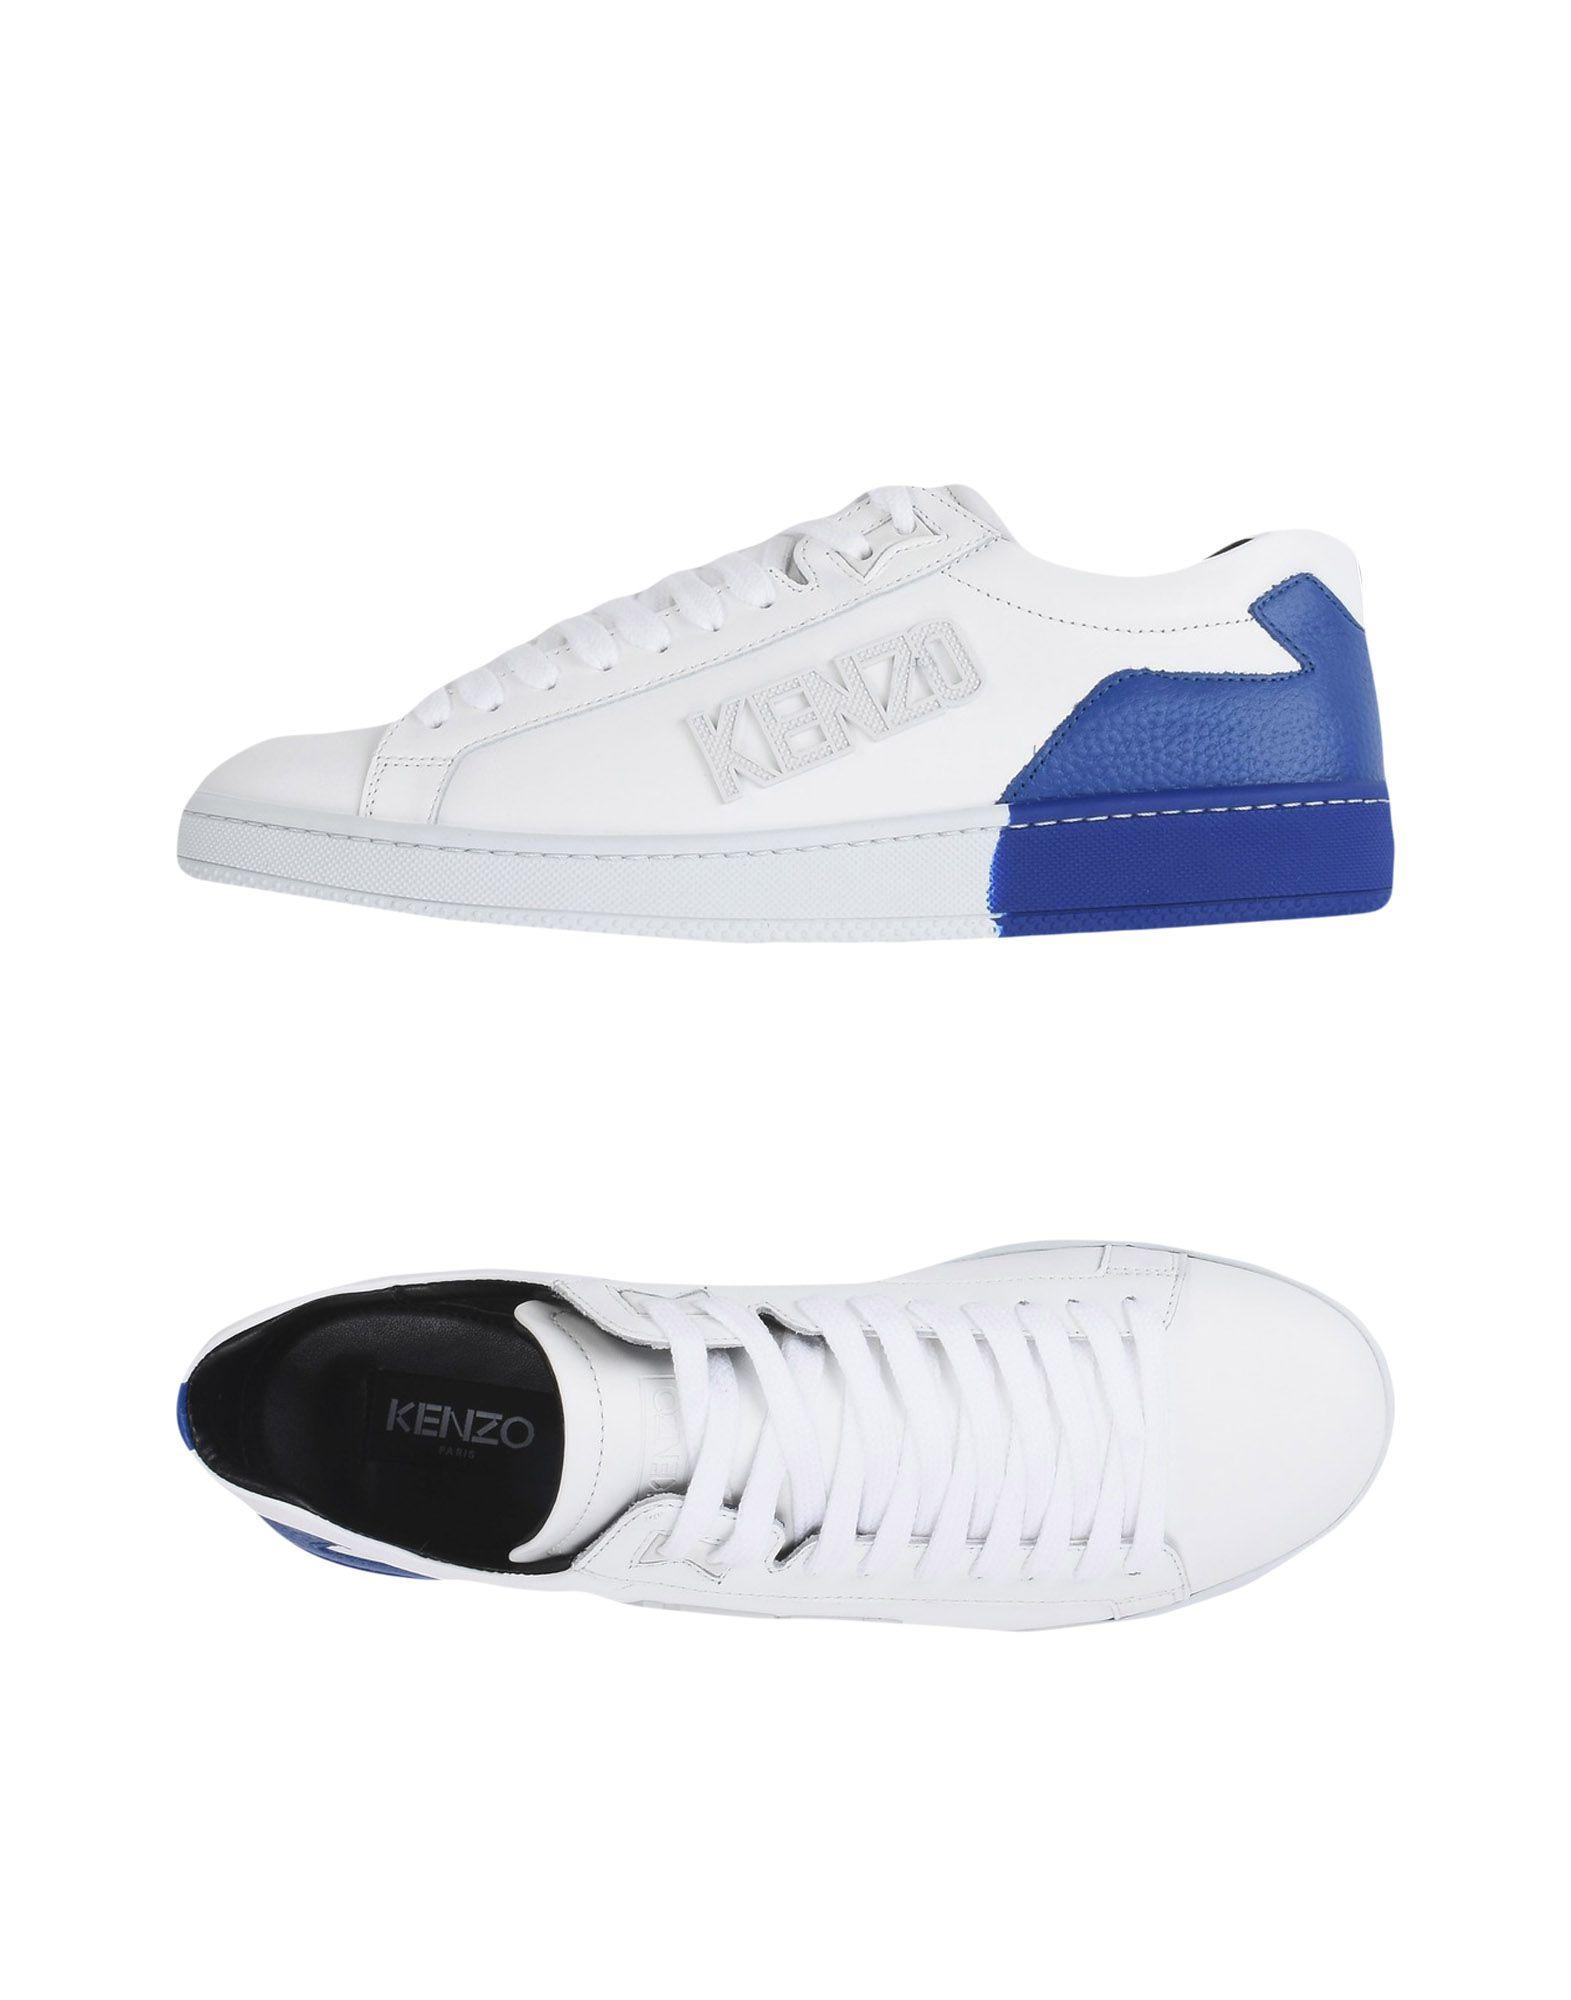 Sneakers Kenzo L50 - Sport Nappa - Homme - Sneakers Kenzo sur